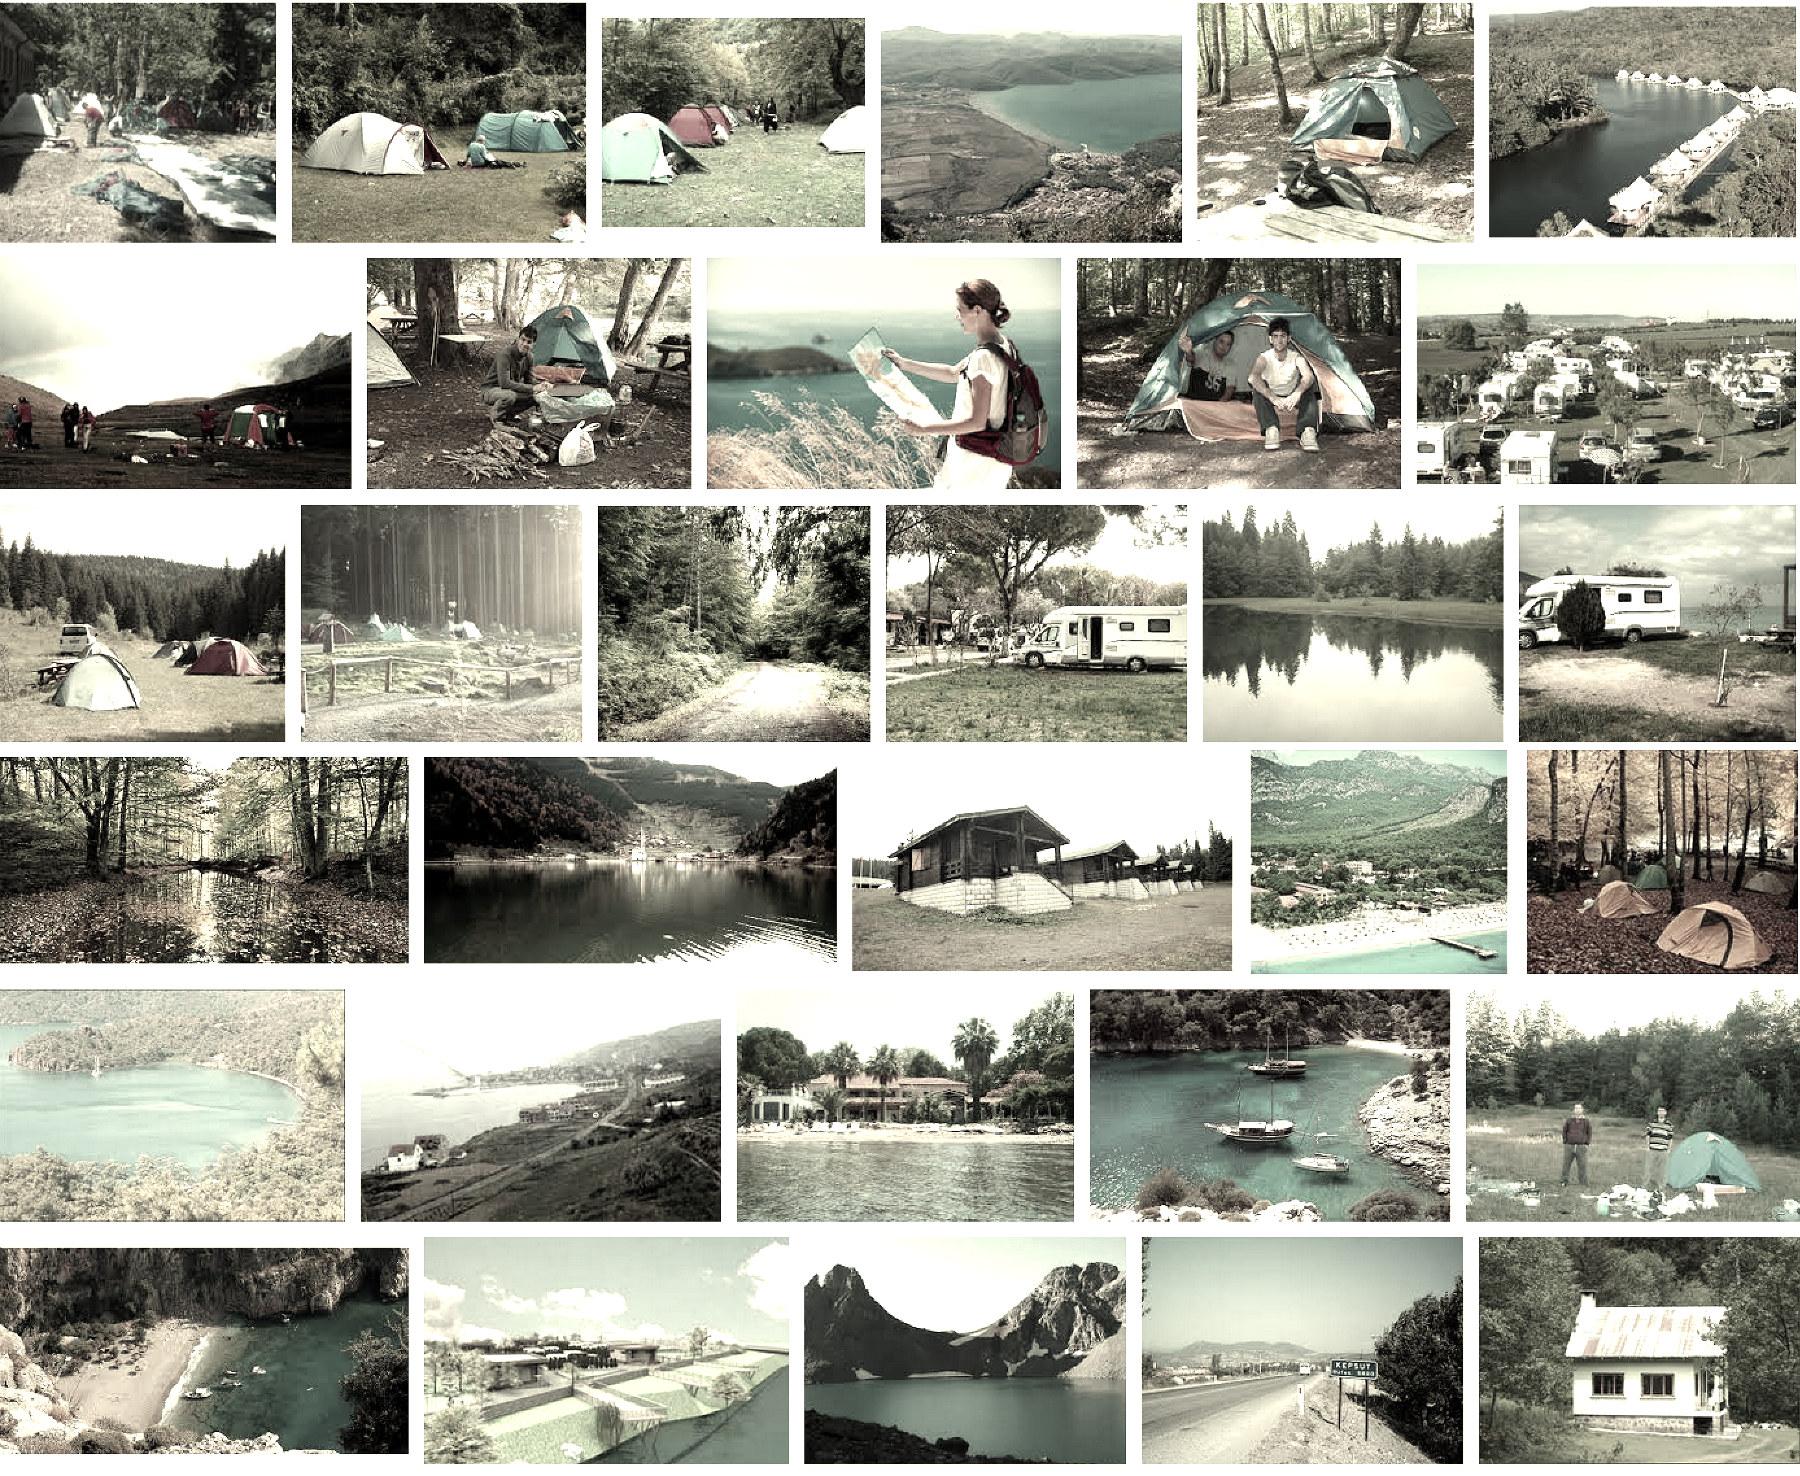 Best_campsites_in_Turkey